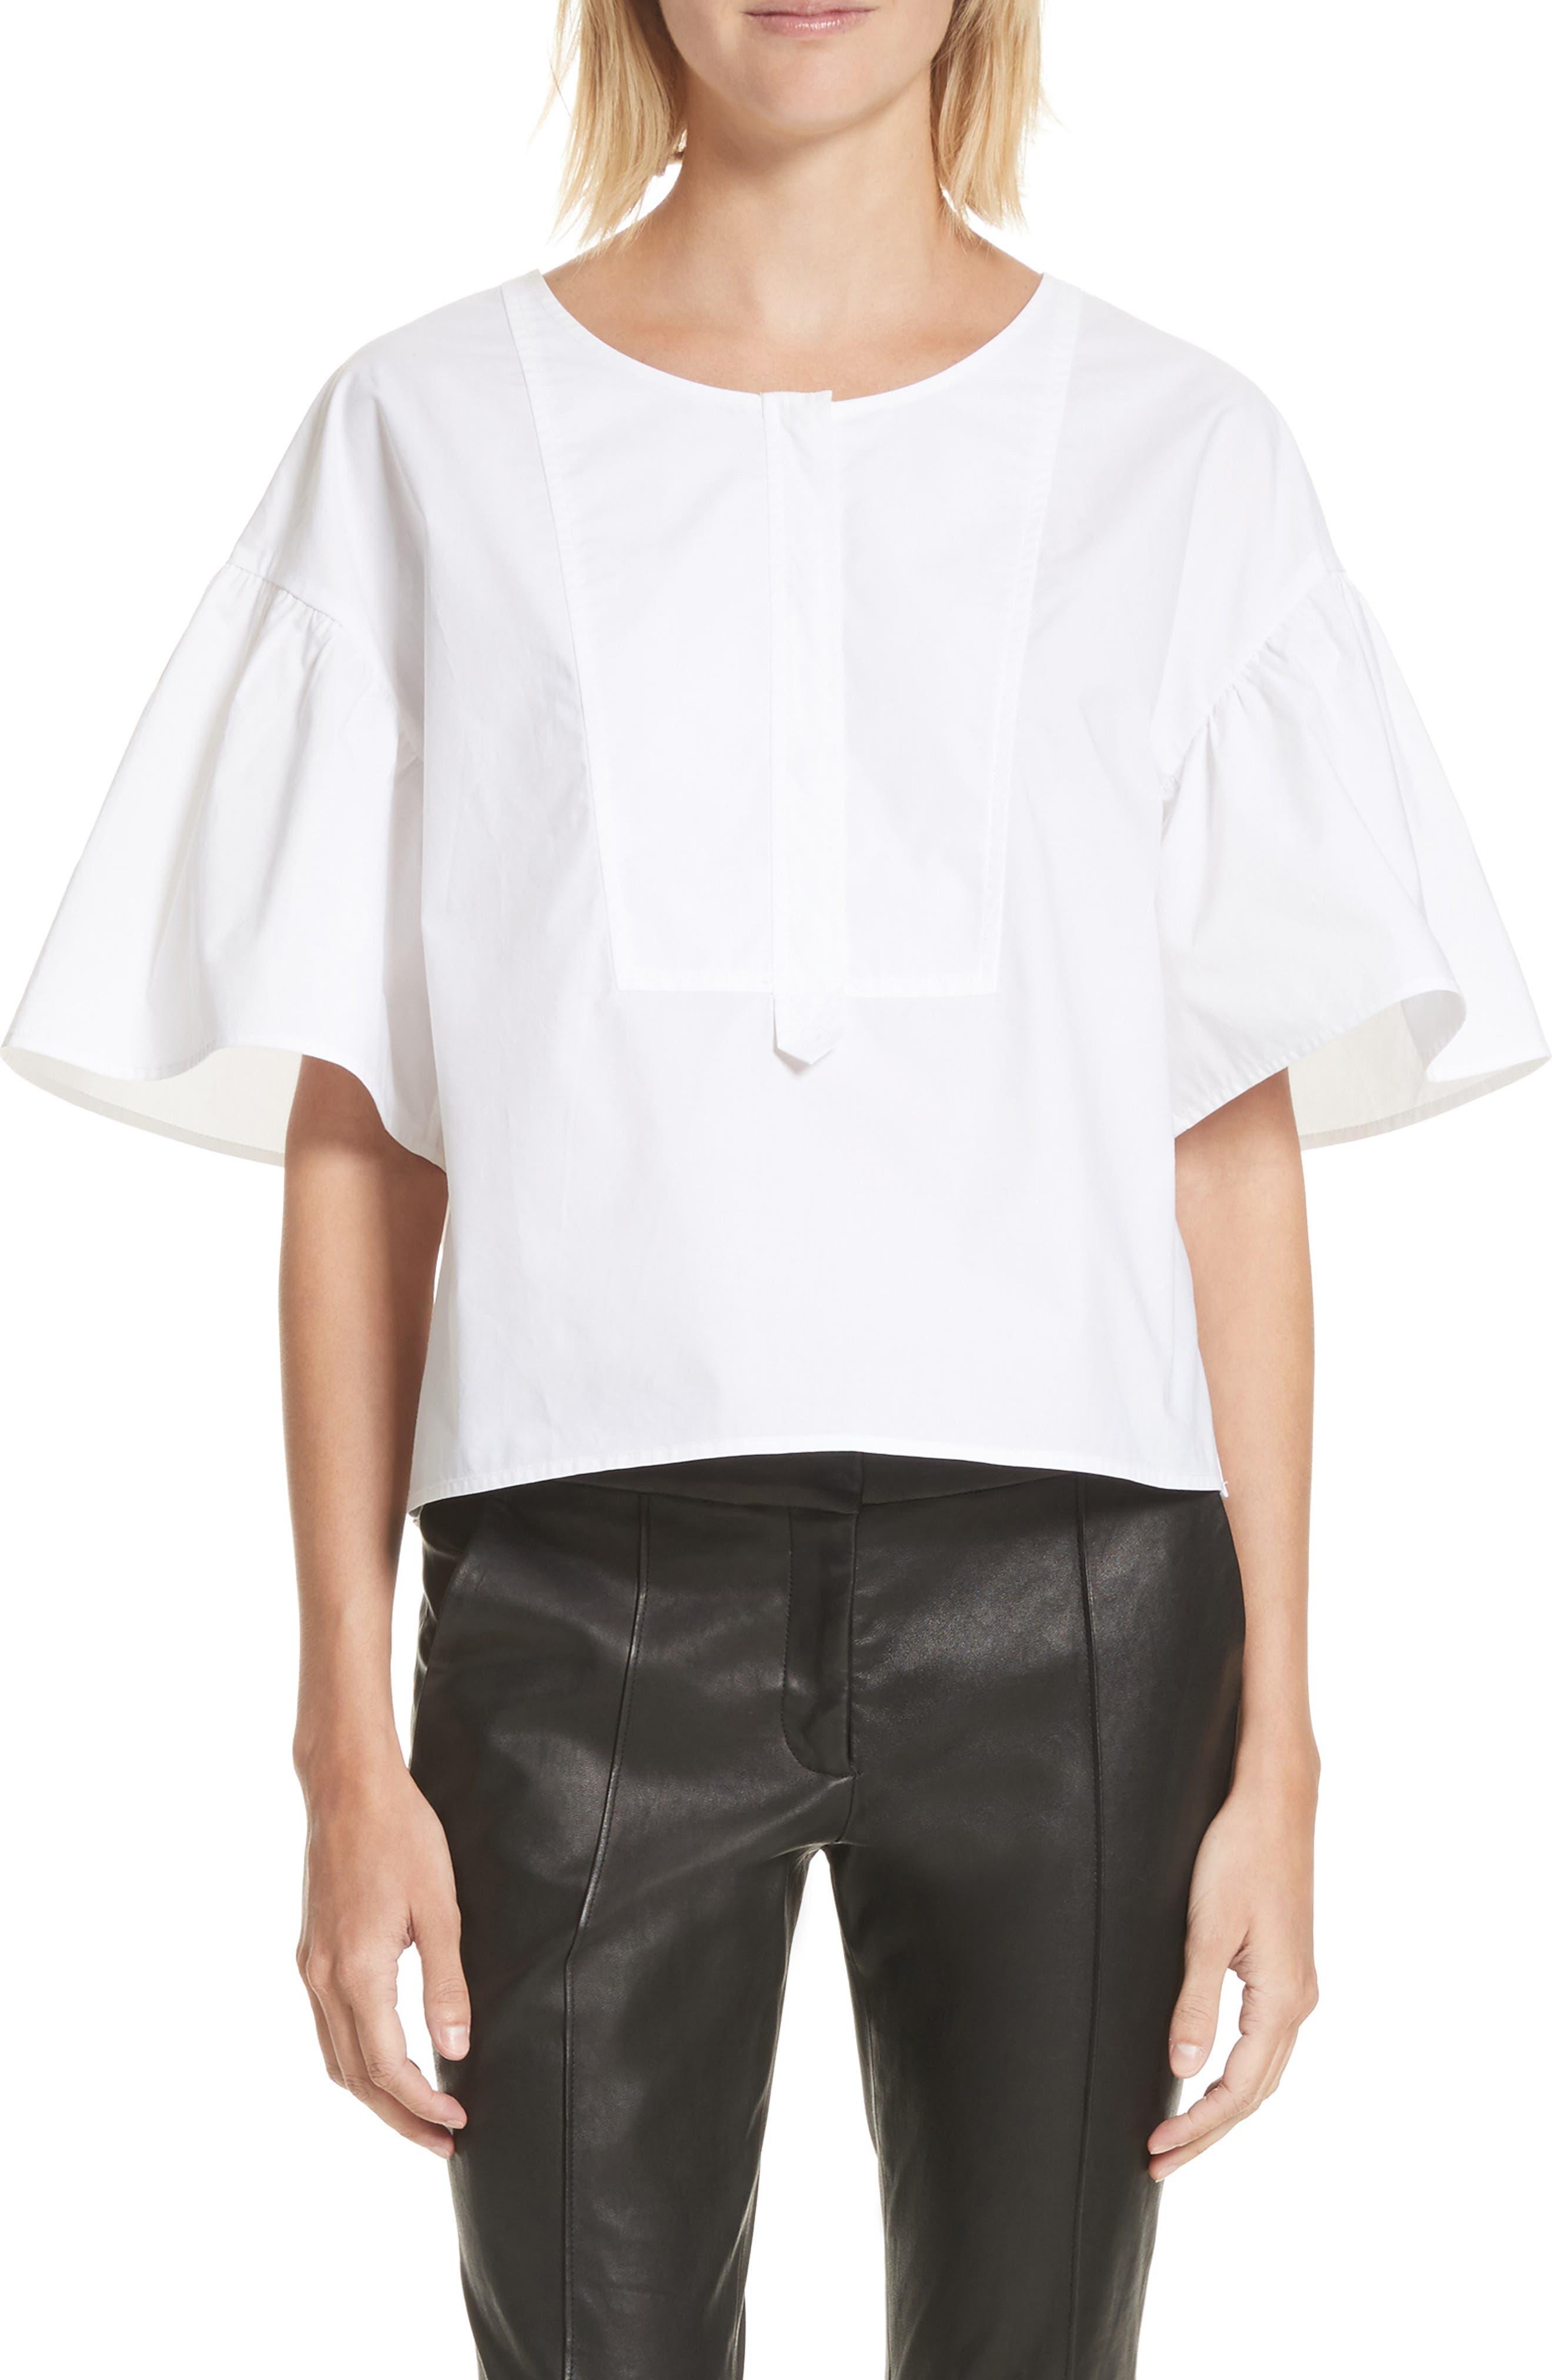 Kyrie Cotton Top,                         Main,                         color, White